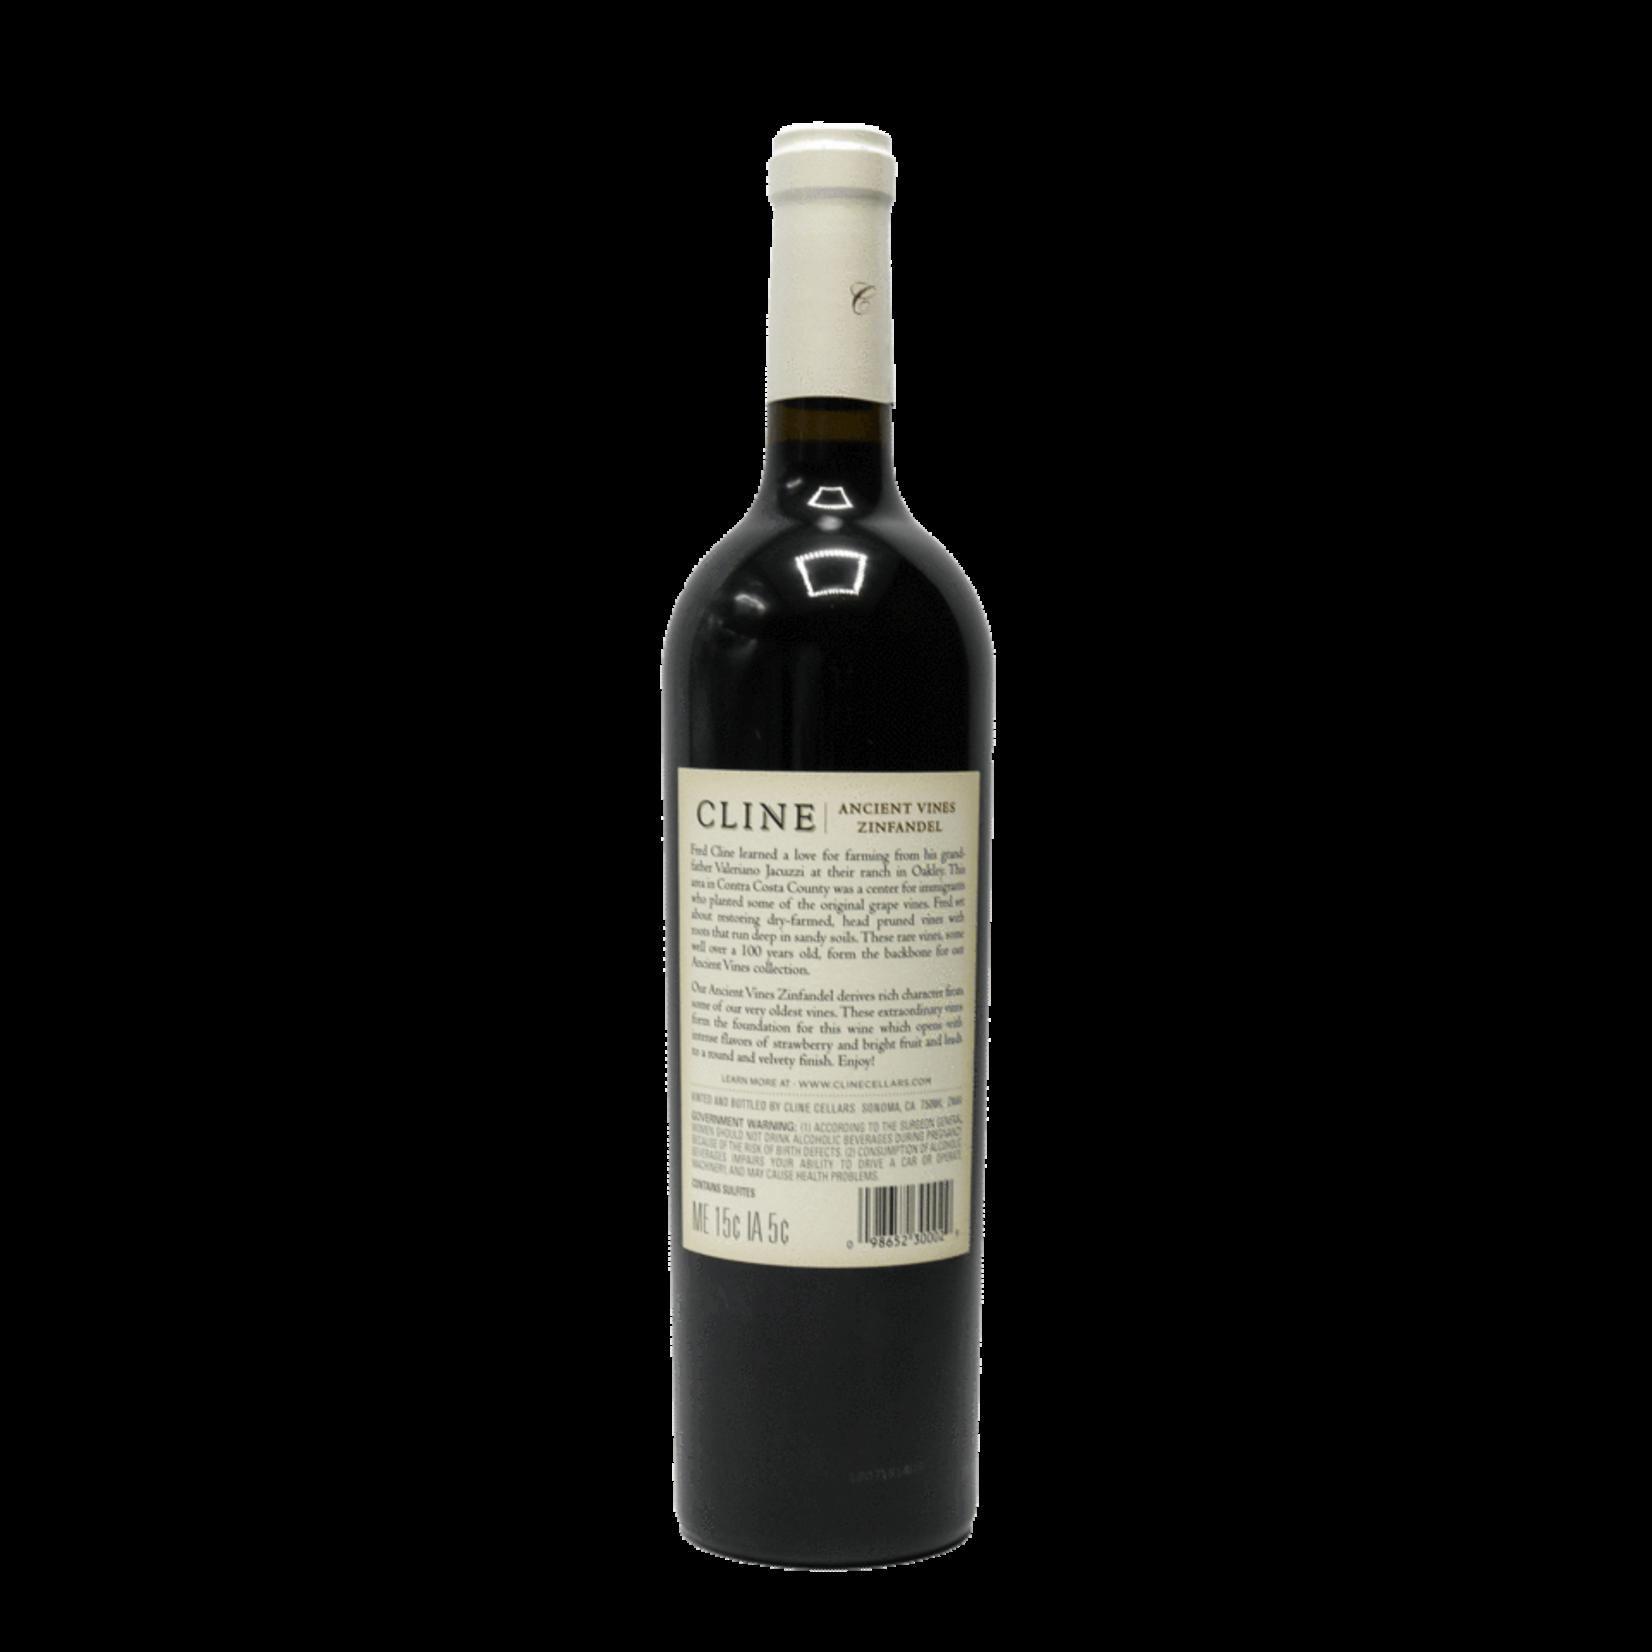 Wine Cline Cellars Zinfandel Ancient Vines 2017